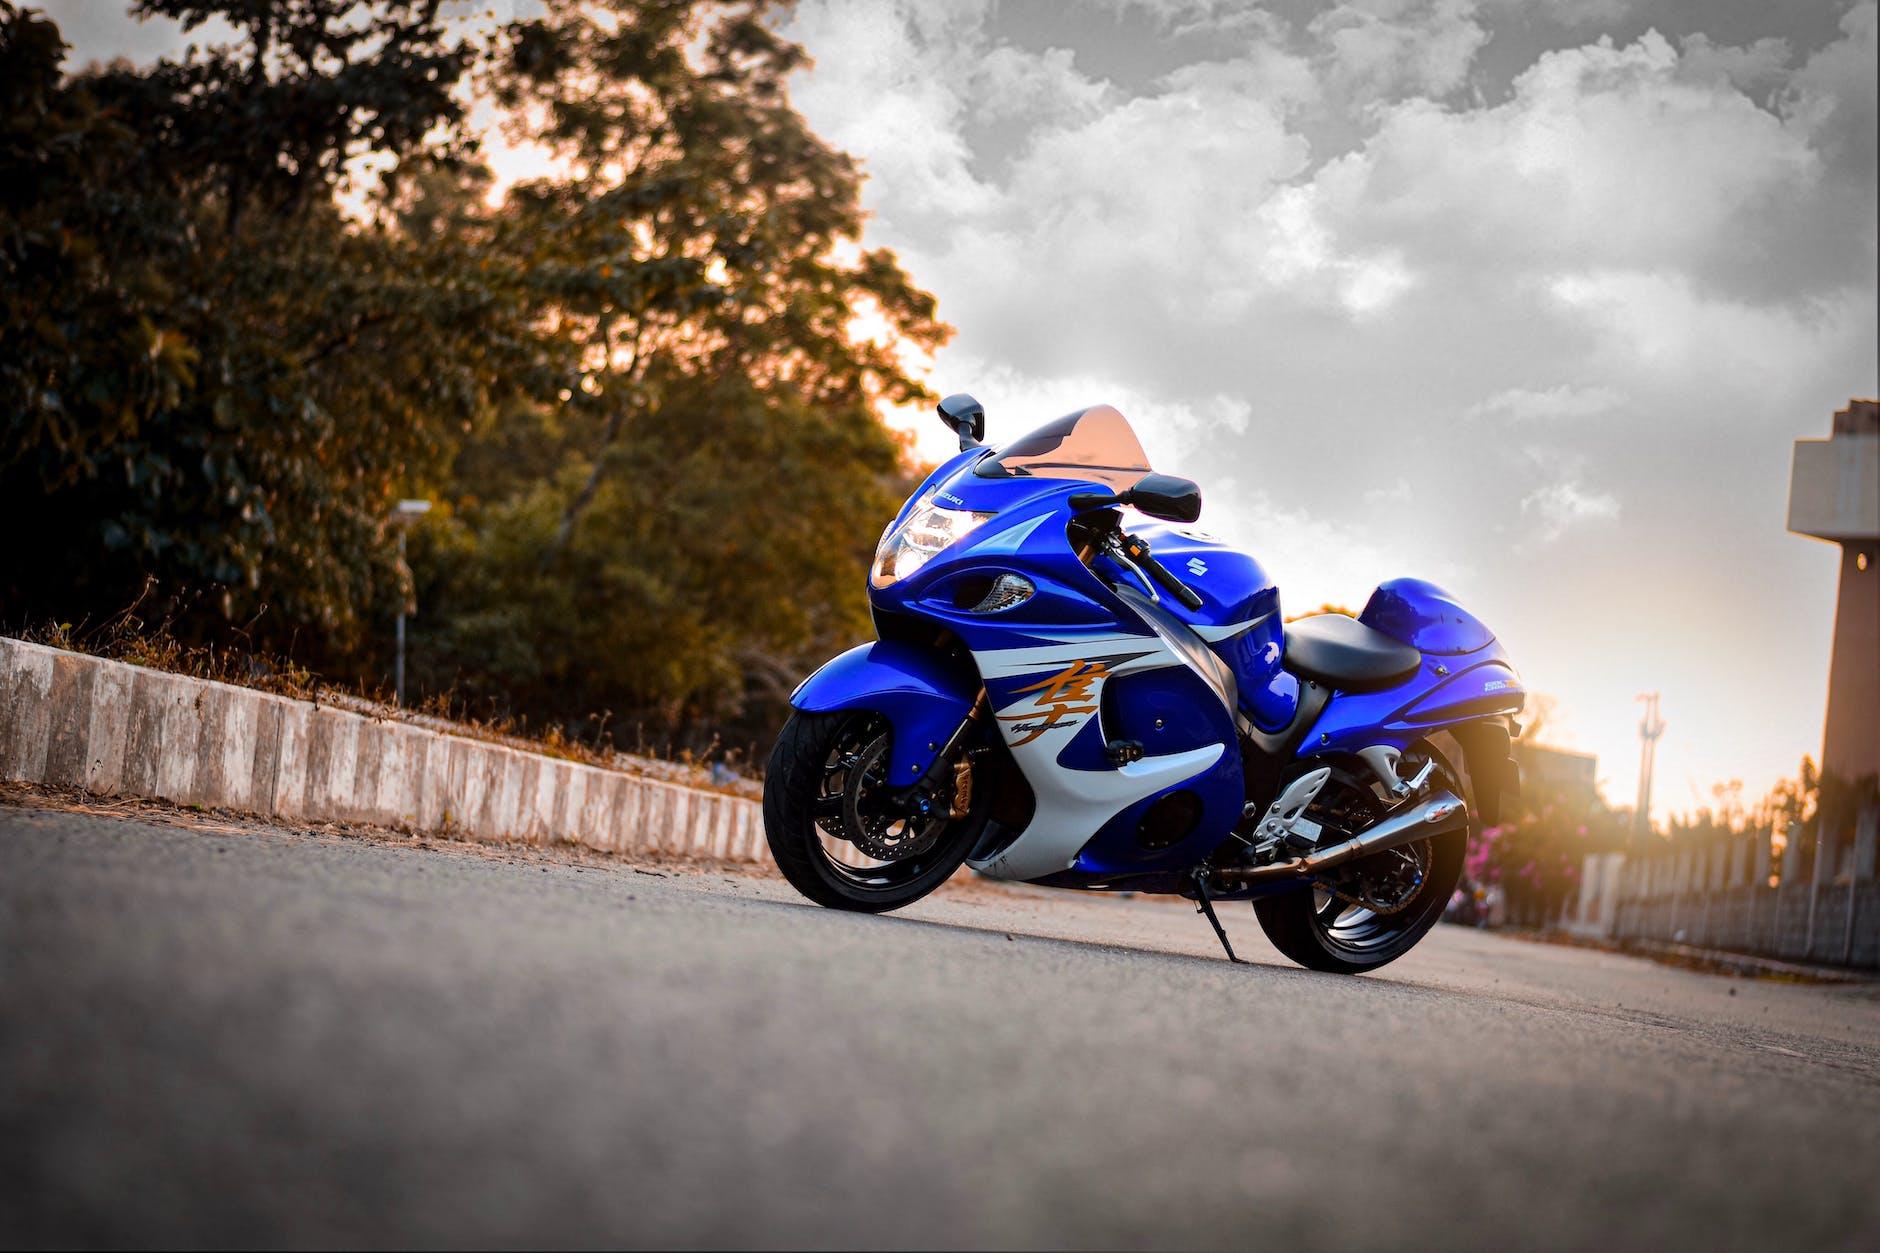 картинки на телефон обои мотоциклы сузуки осложненном течении